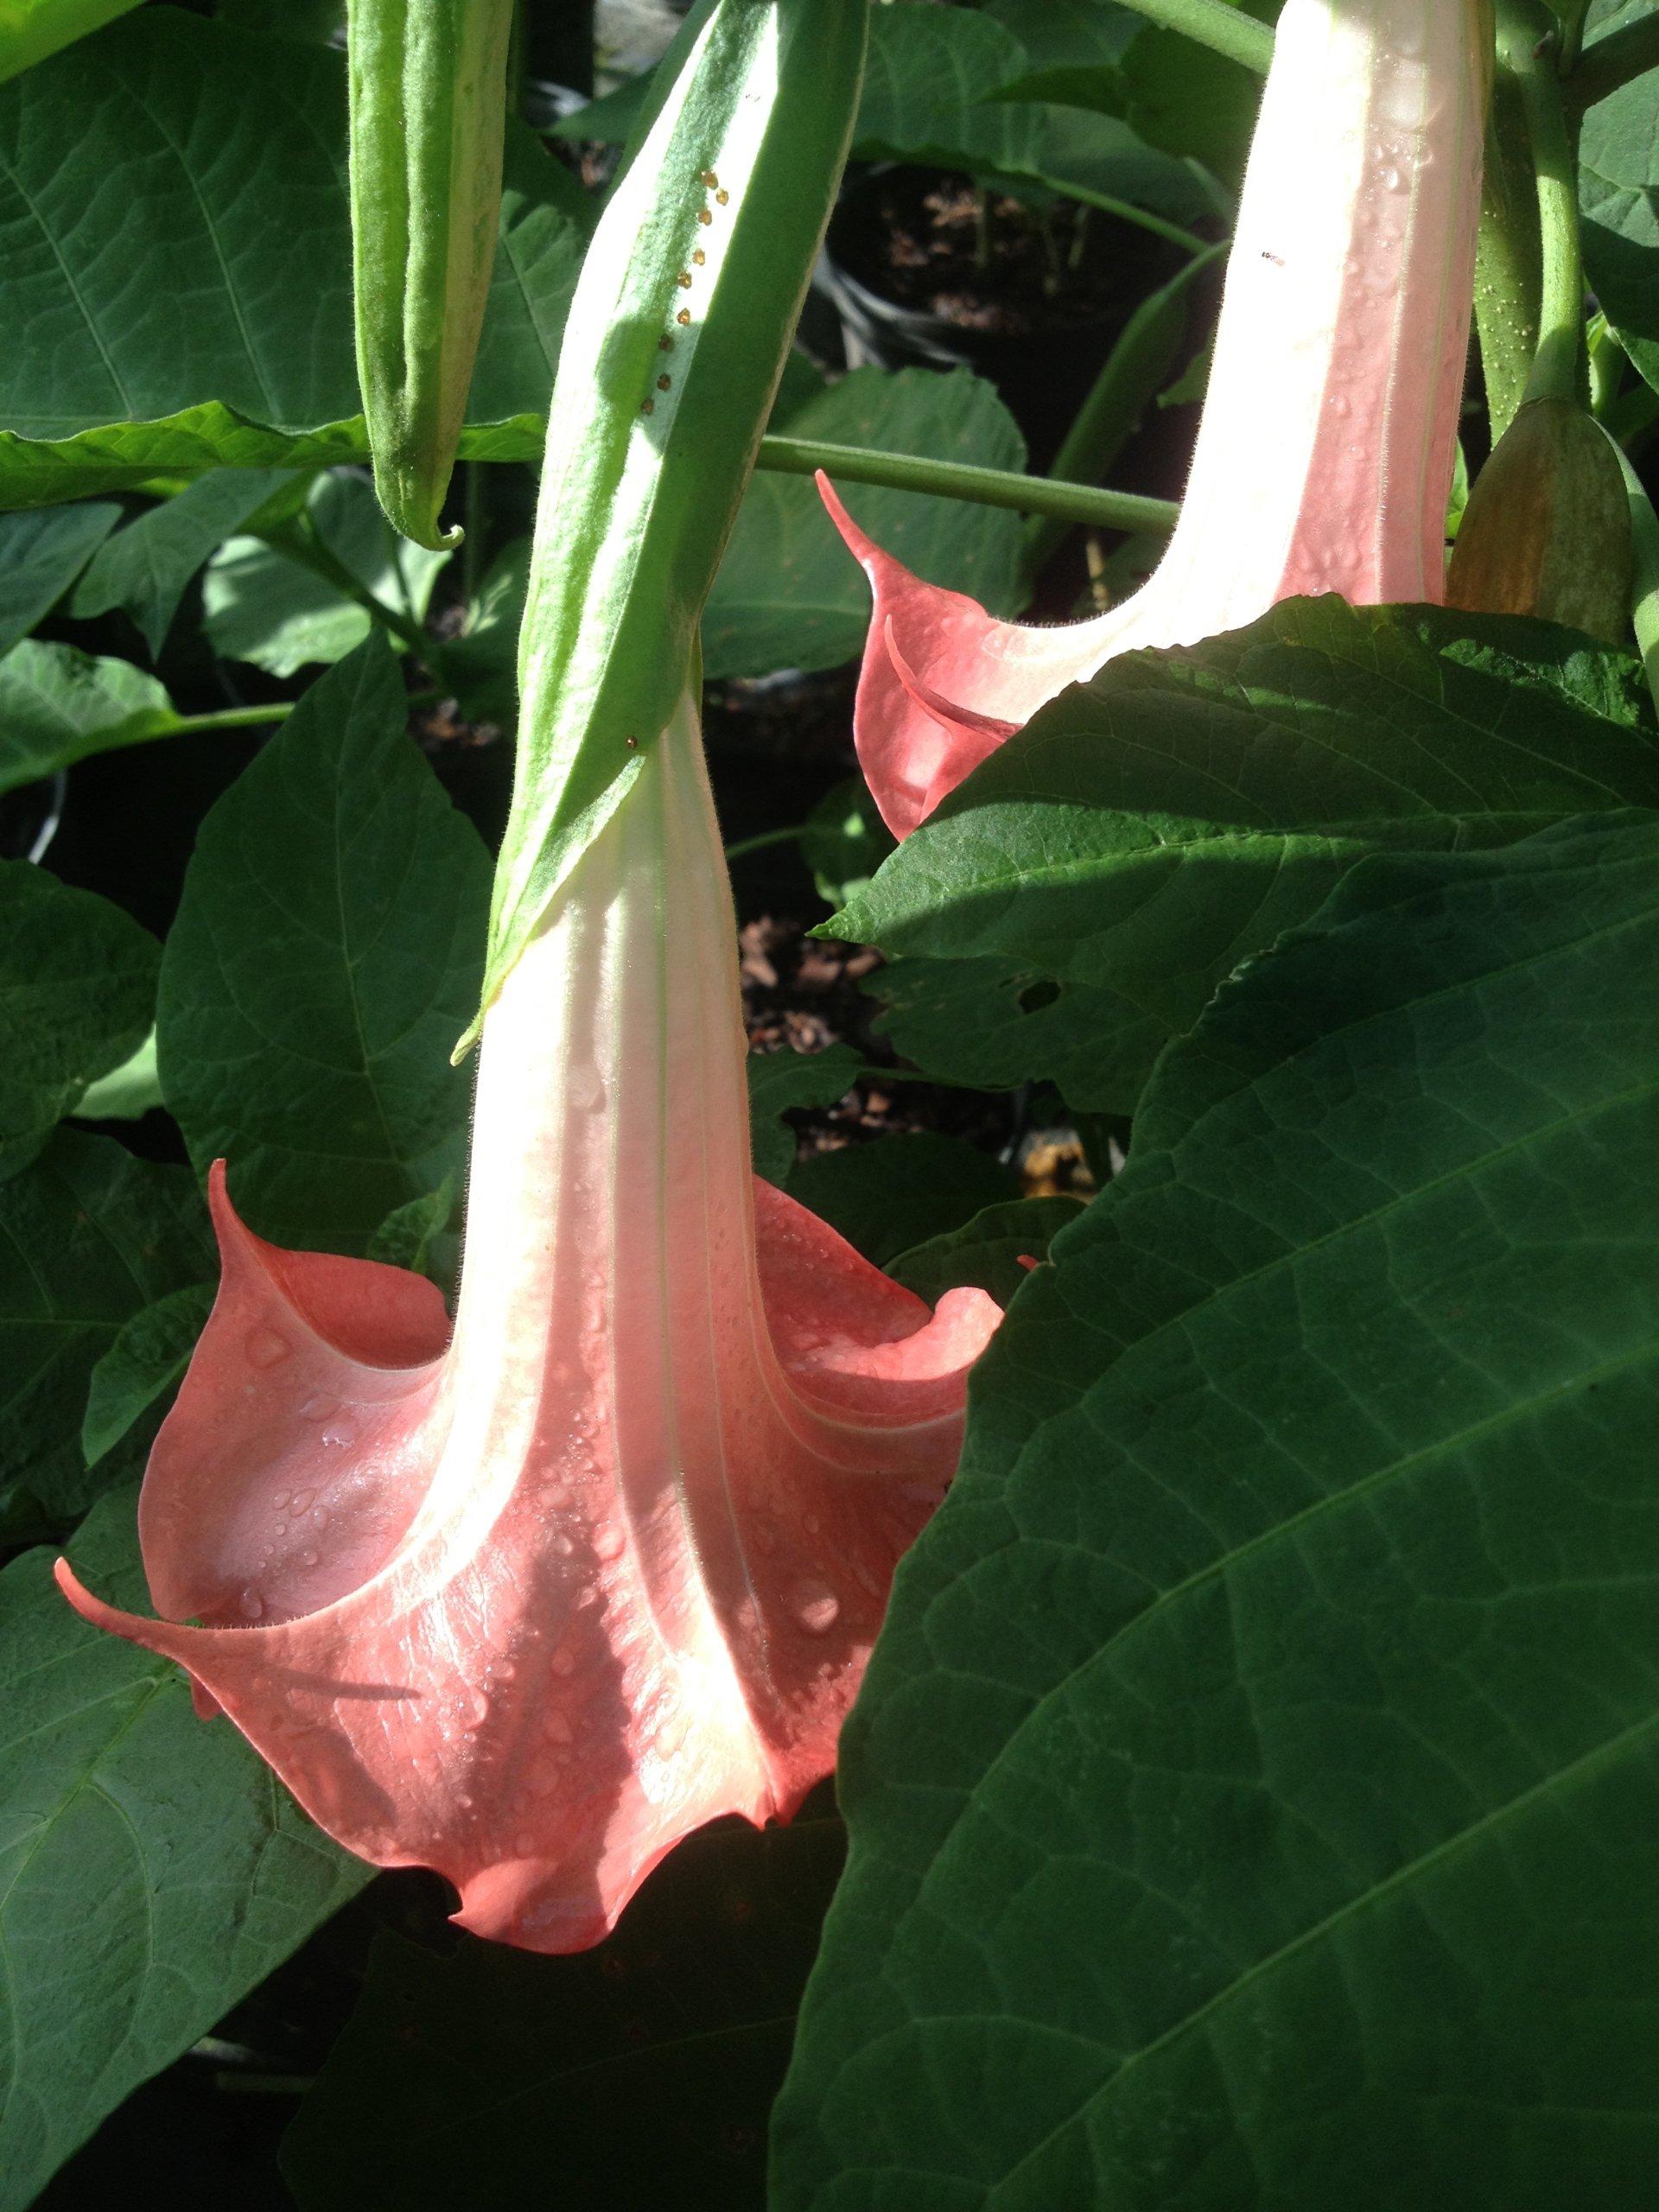 DWARF CHERUB Brugmansia Angels Trumpet Live Tropical Plant Pink Fragrant Flower Starter Size 4 Inch Pot Emeralds TM